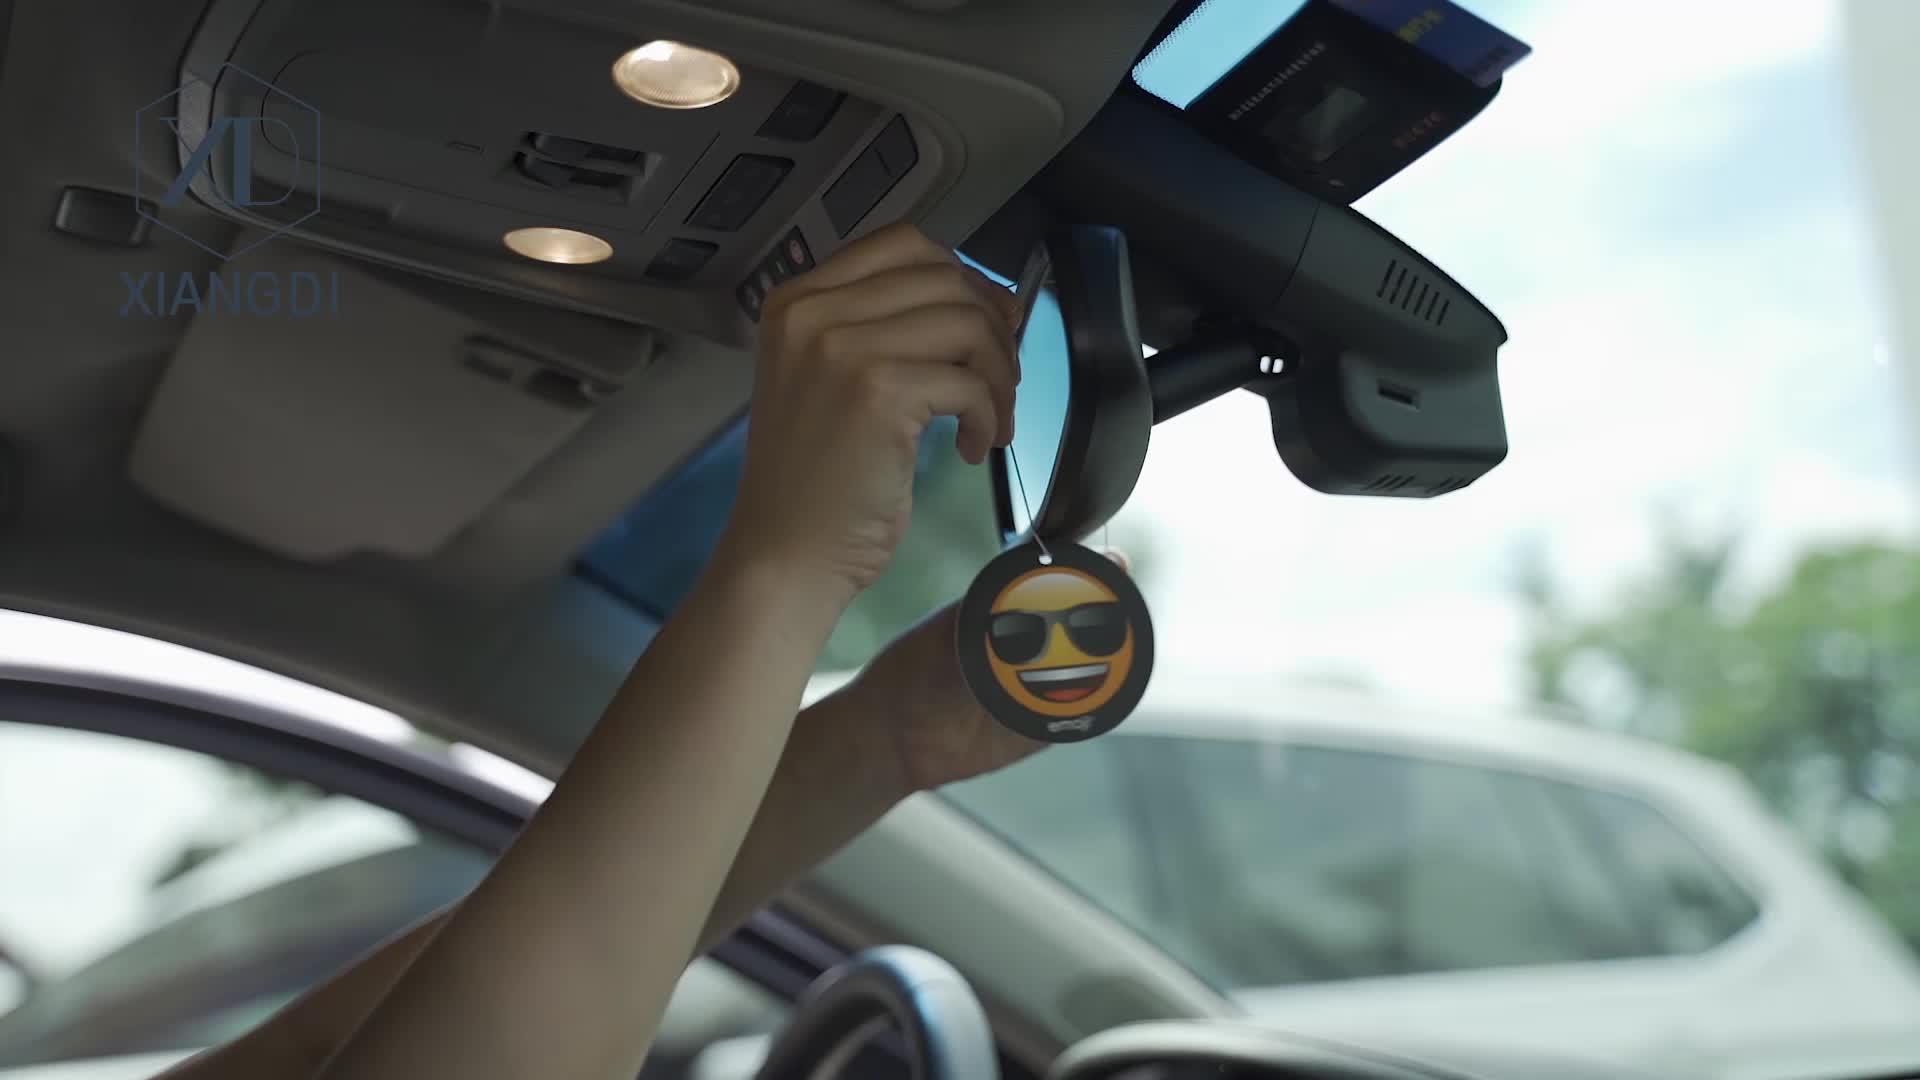 Free samples provided Car Vent Membrane Perfume Car Air Freshener refill